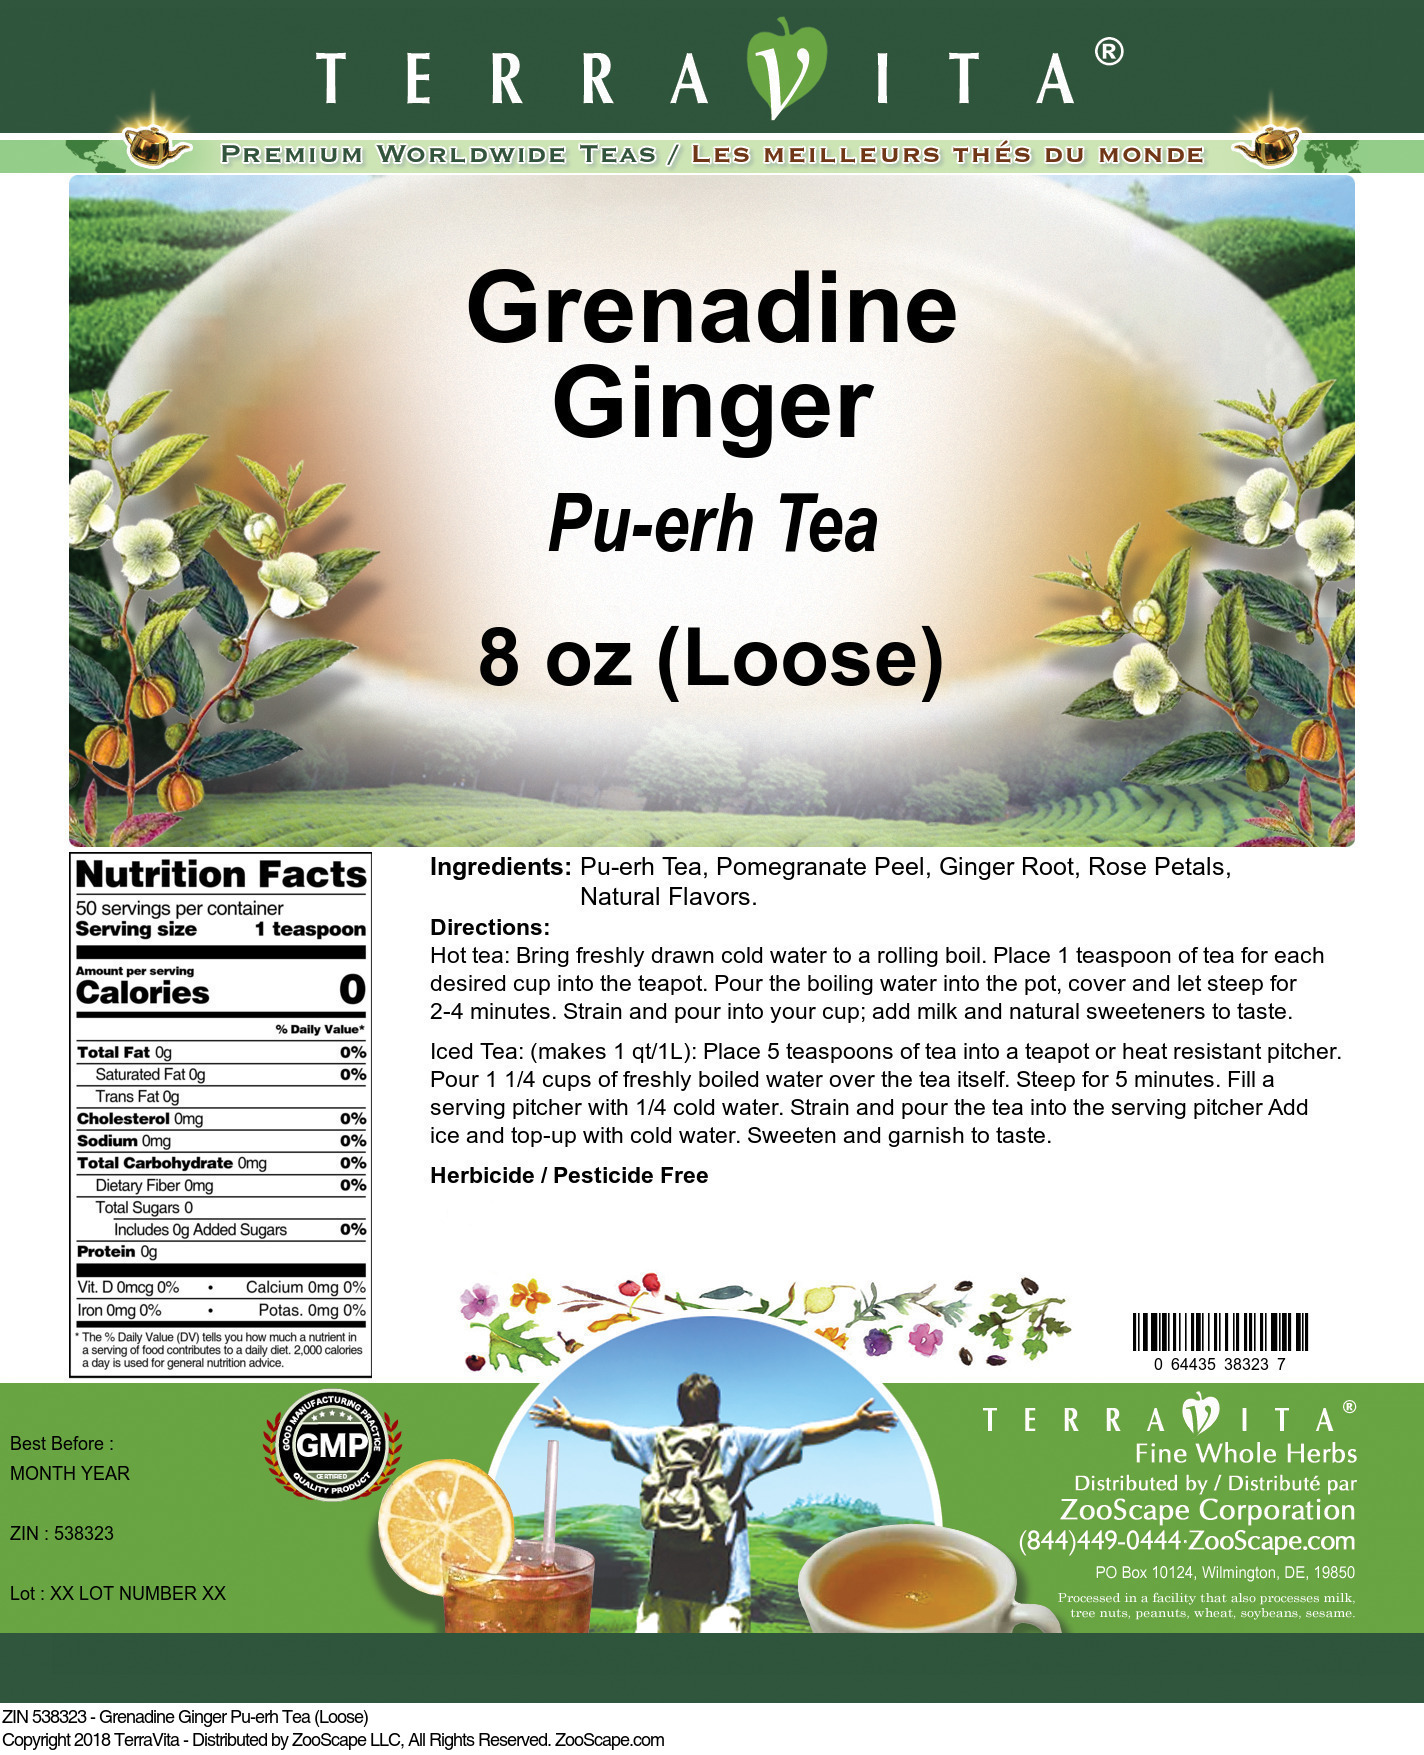 Grenadine Ginger Pu-erh Tea (Loose)